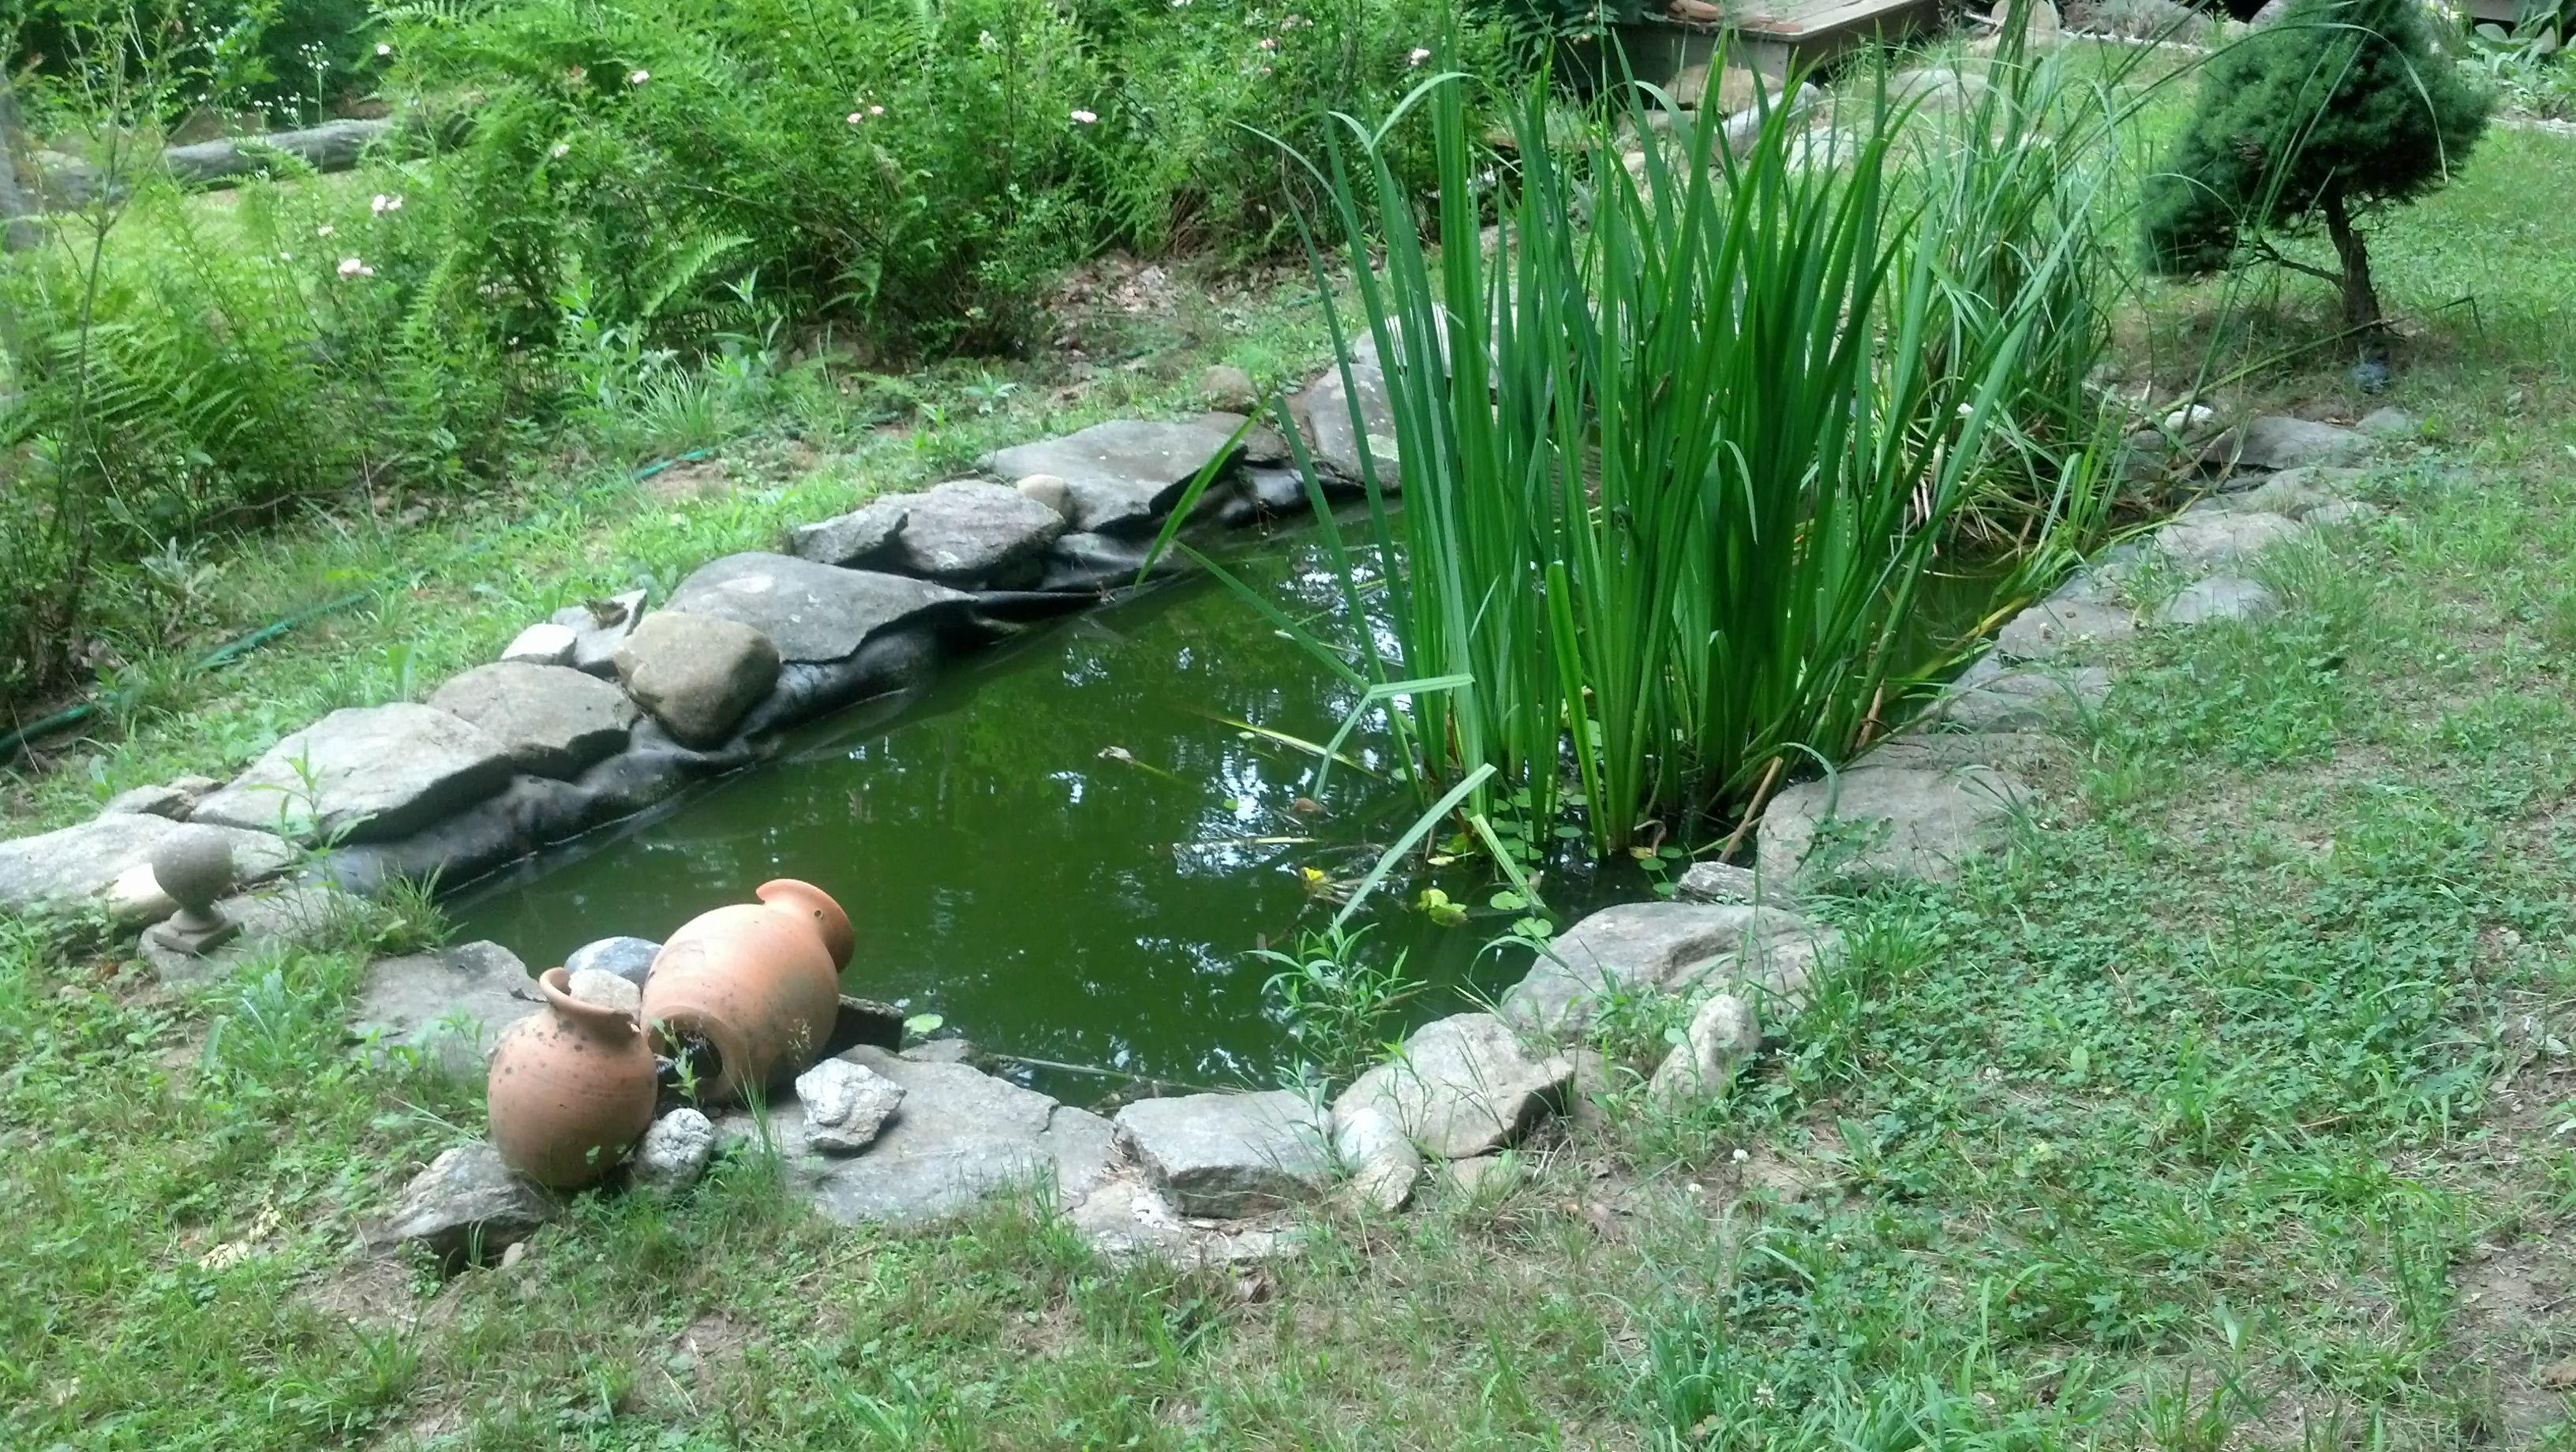 Frog Pond Backyard frog pond | garden | pinterest | pond, backyard and garden